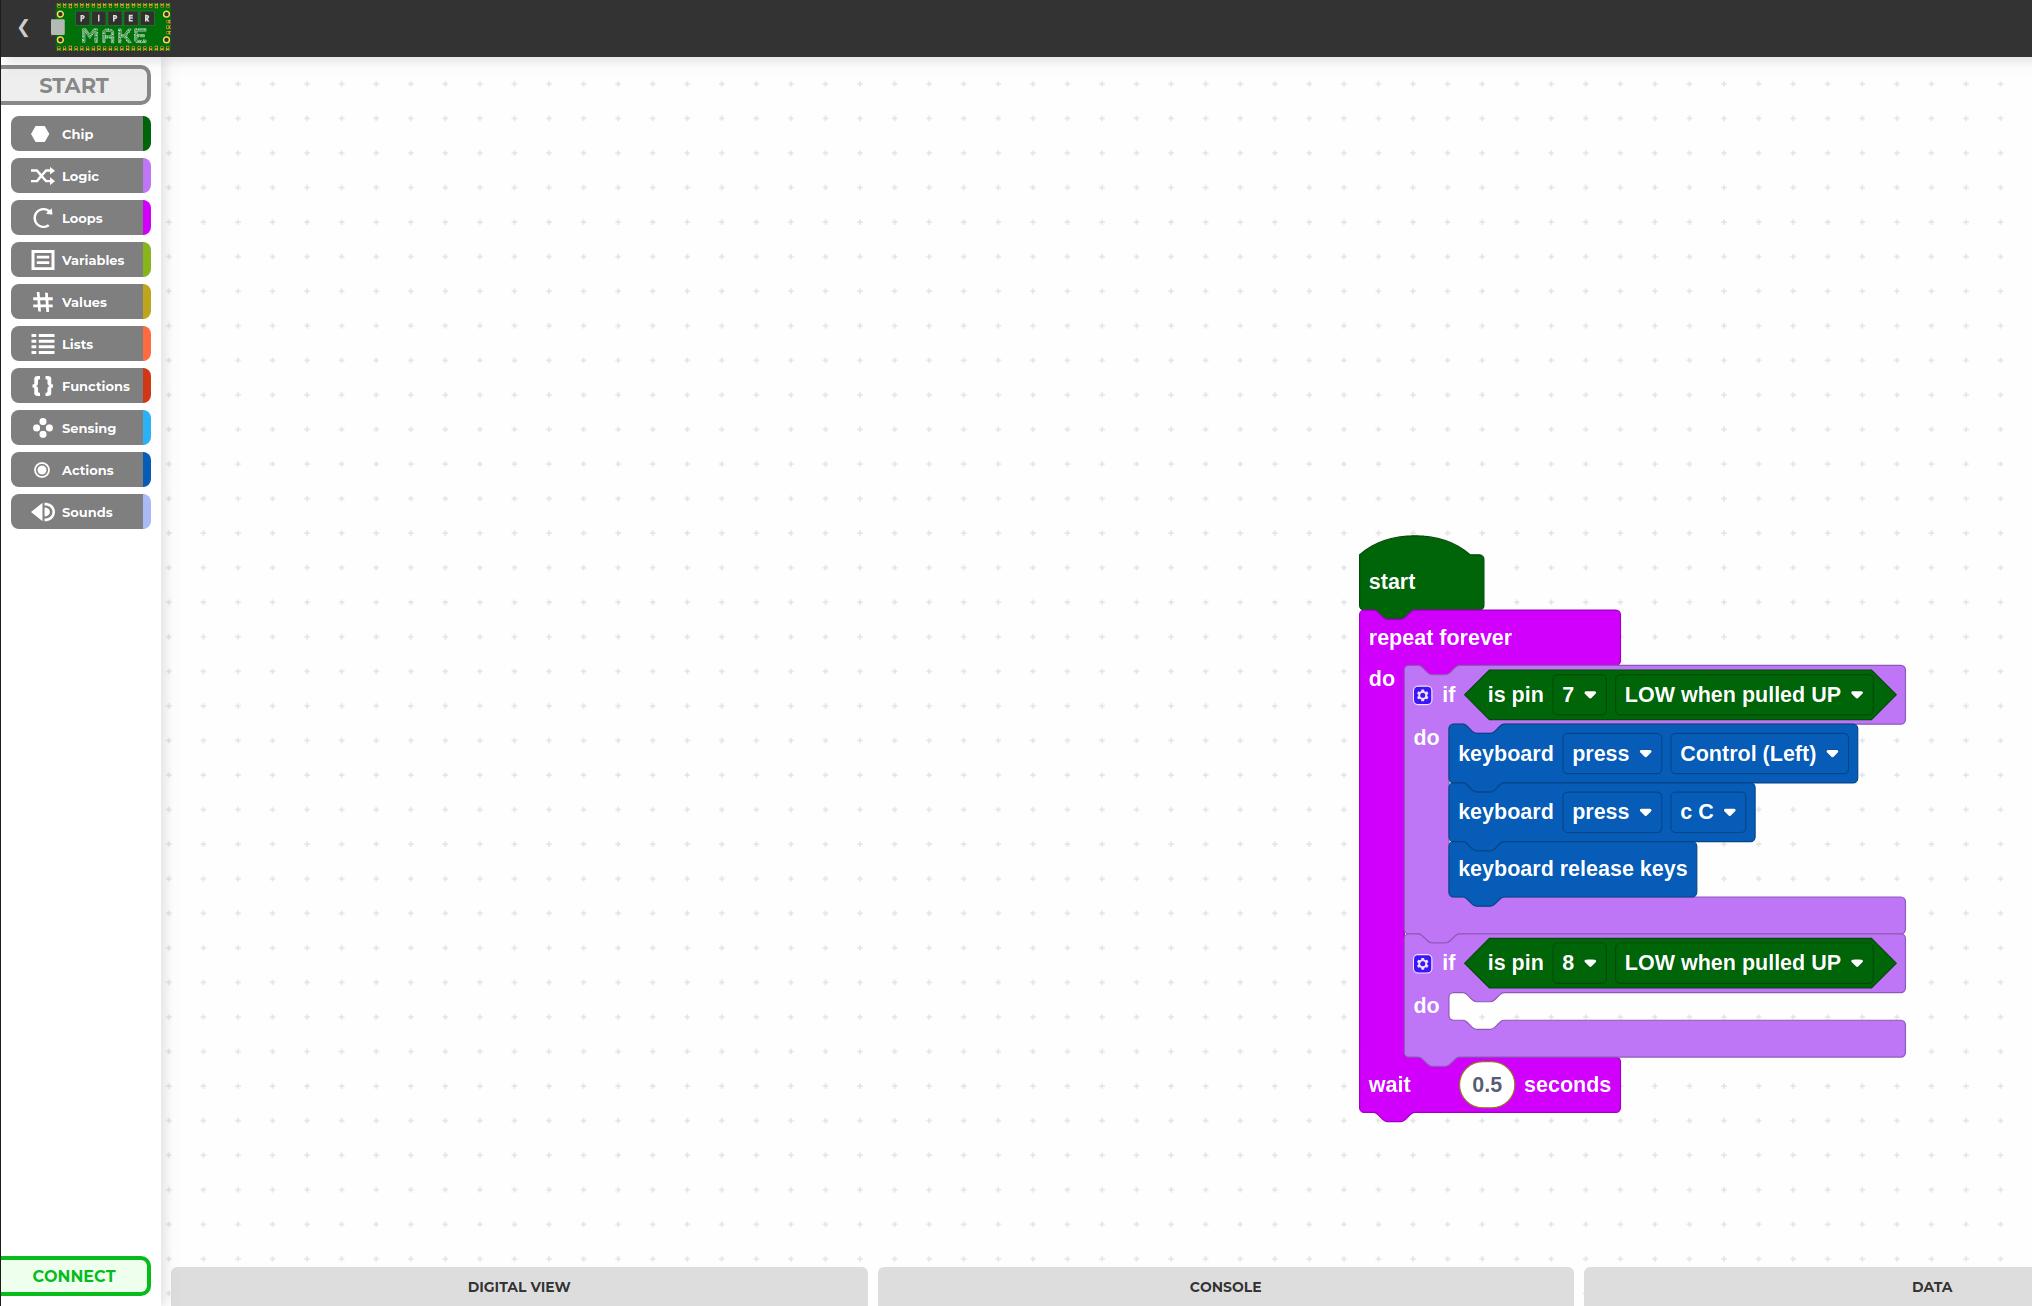 raspberry_pi_Screenshot_from_2021-03-24_16-54-49.png